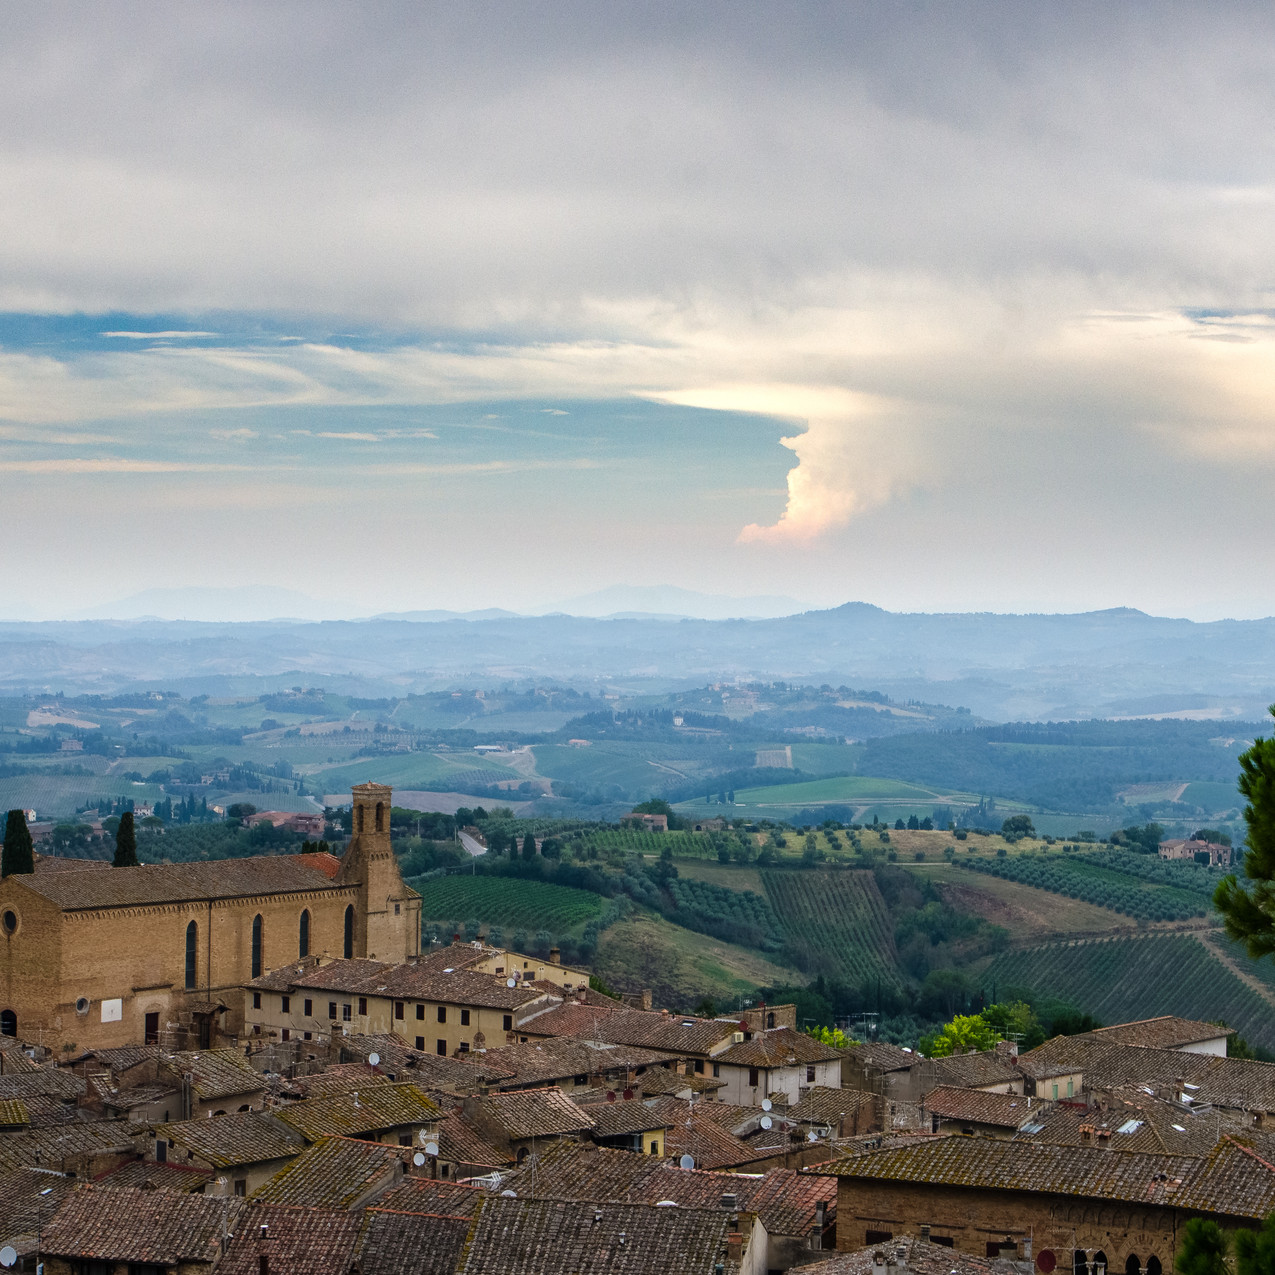 Roofs of San Gimignano.